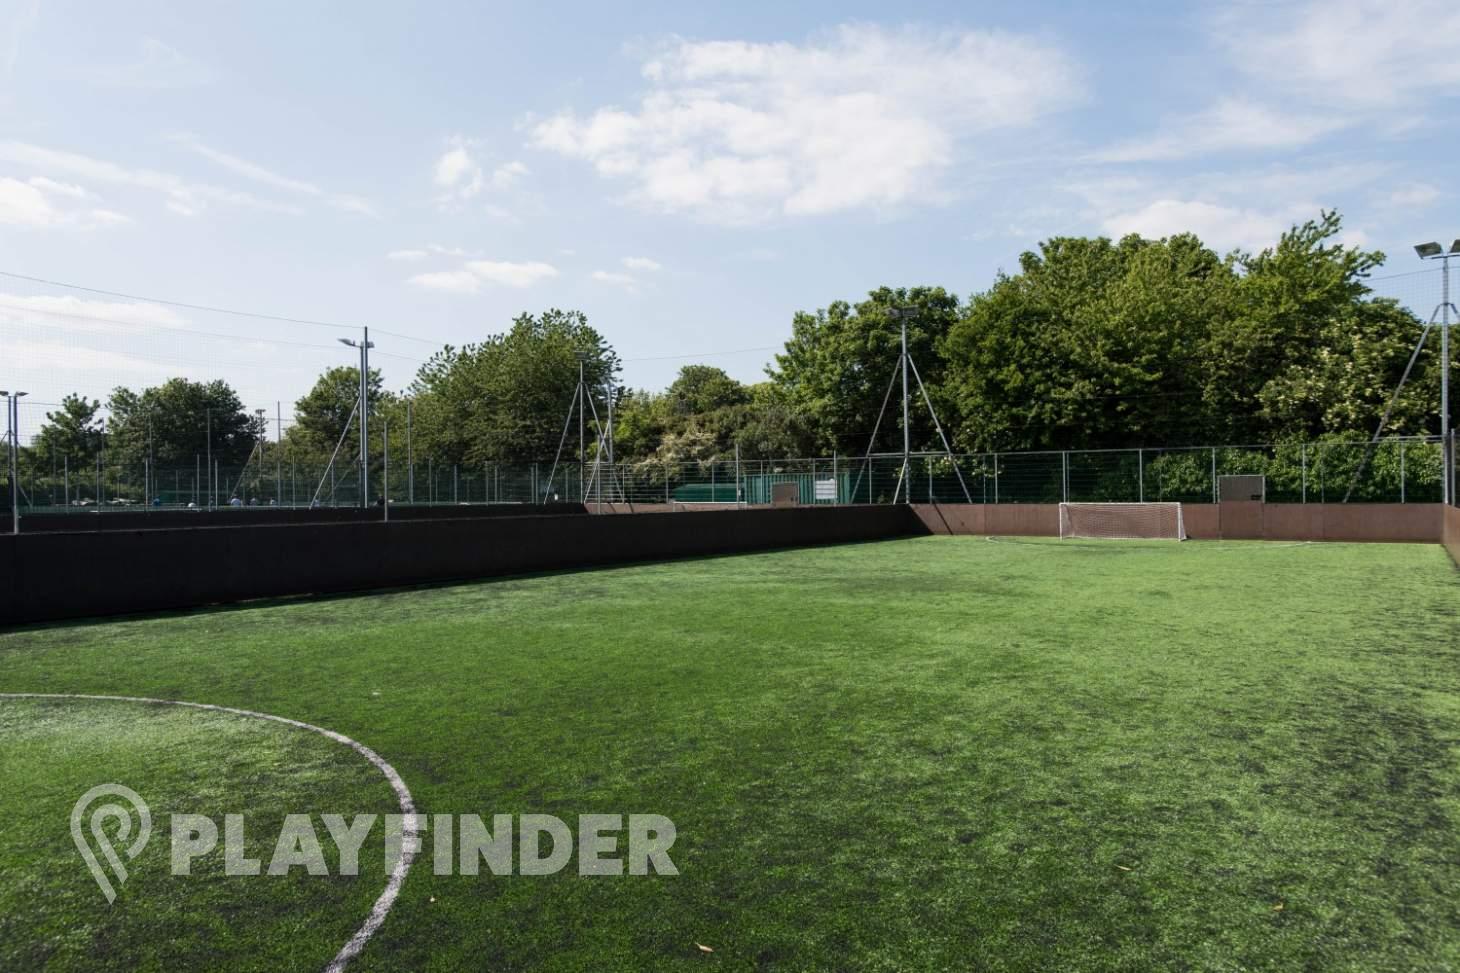 Rocks Lane Barnes 7 a side | 3G Astroturf football pitch